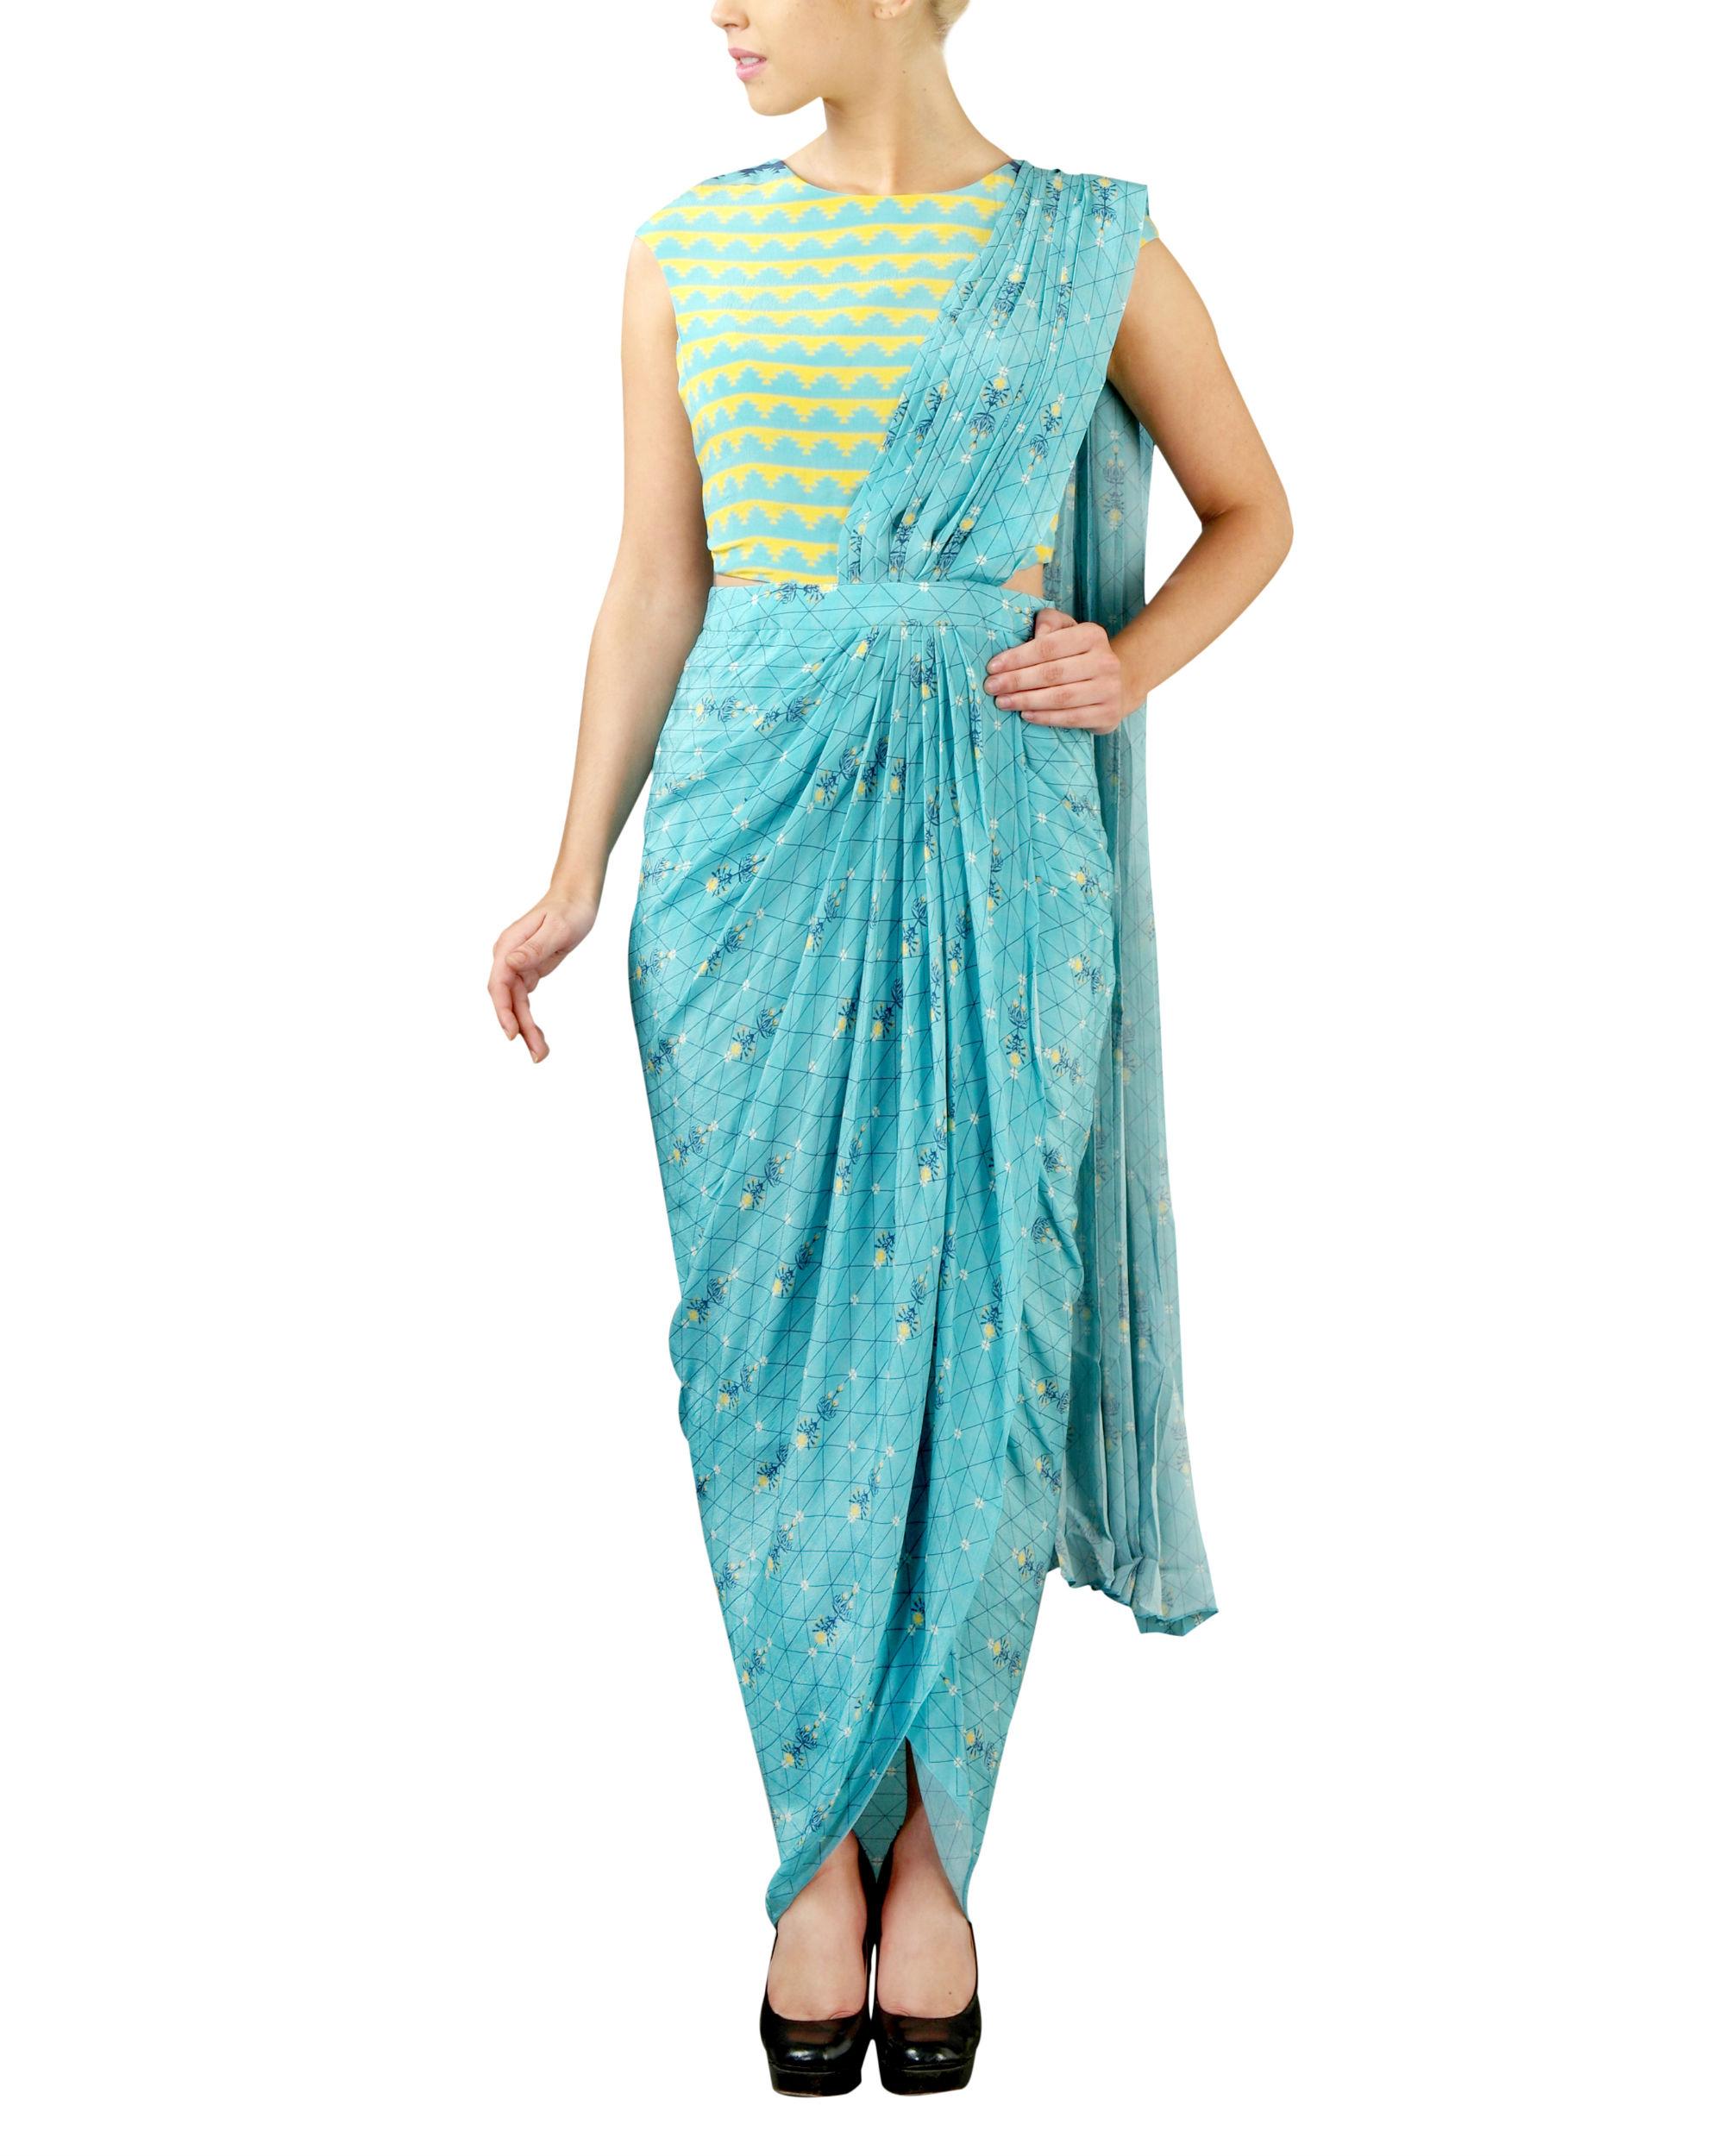 Turquoise draped saree